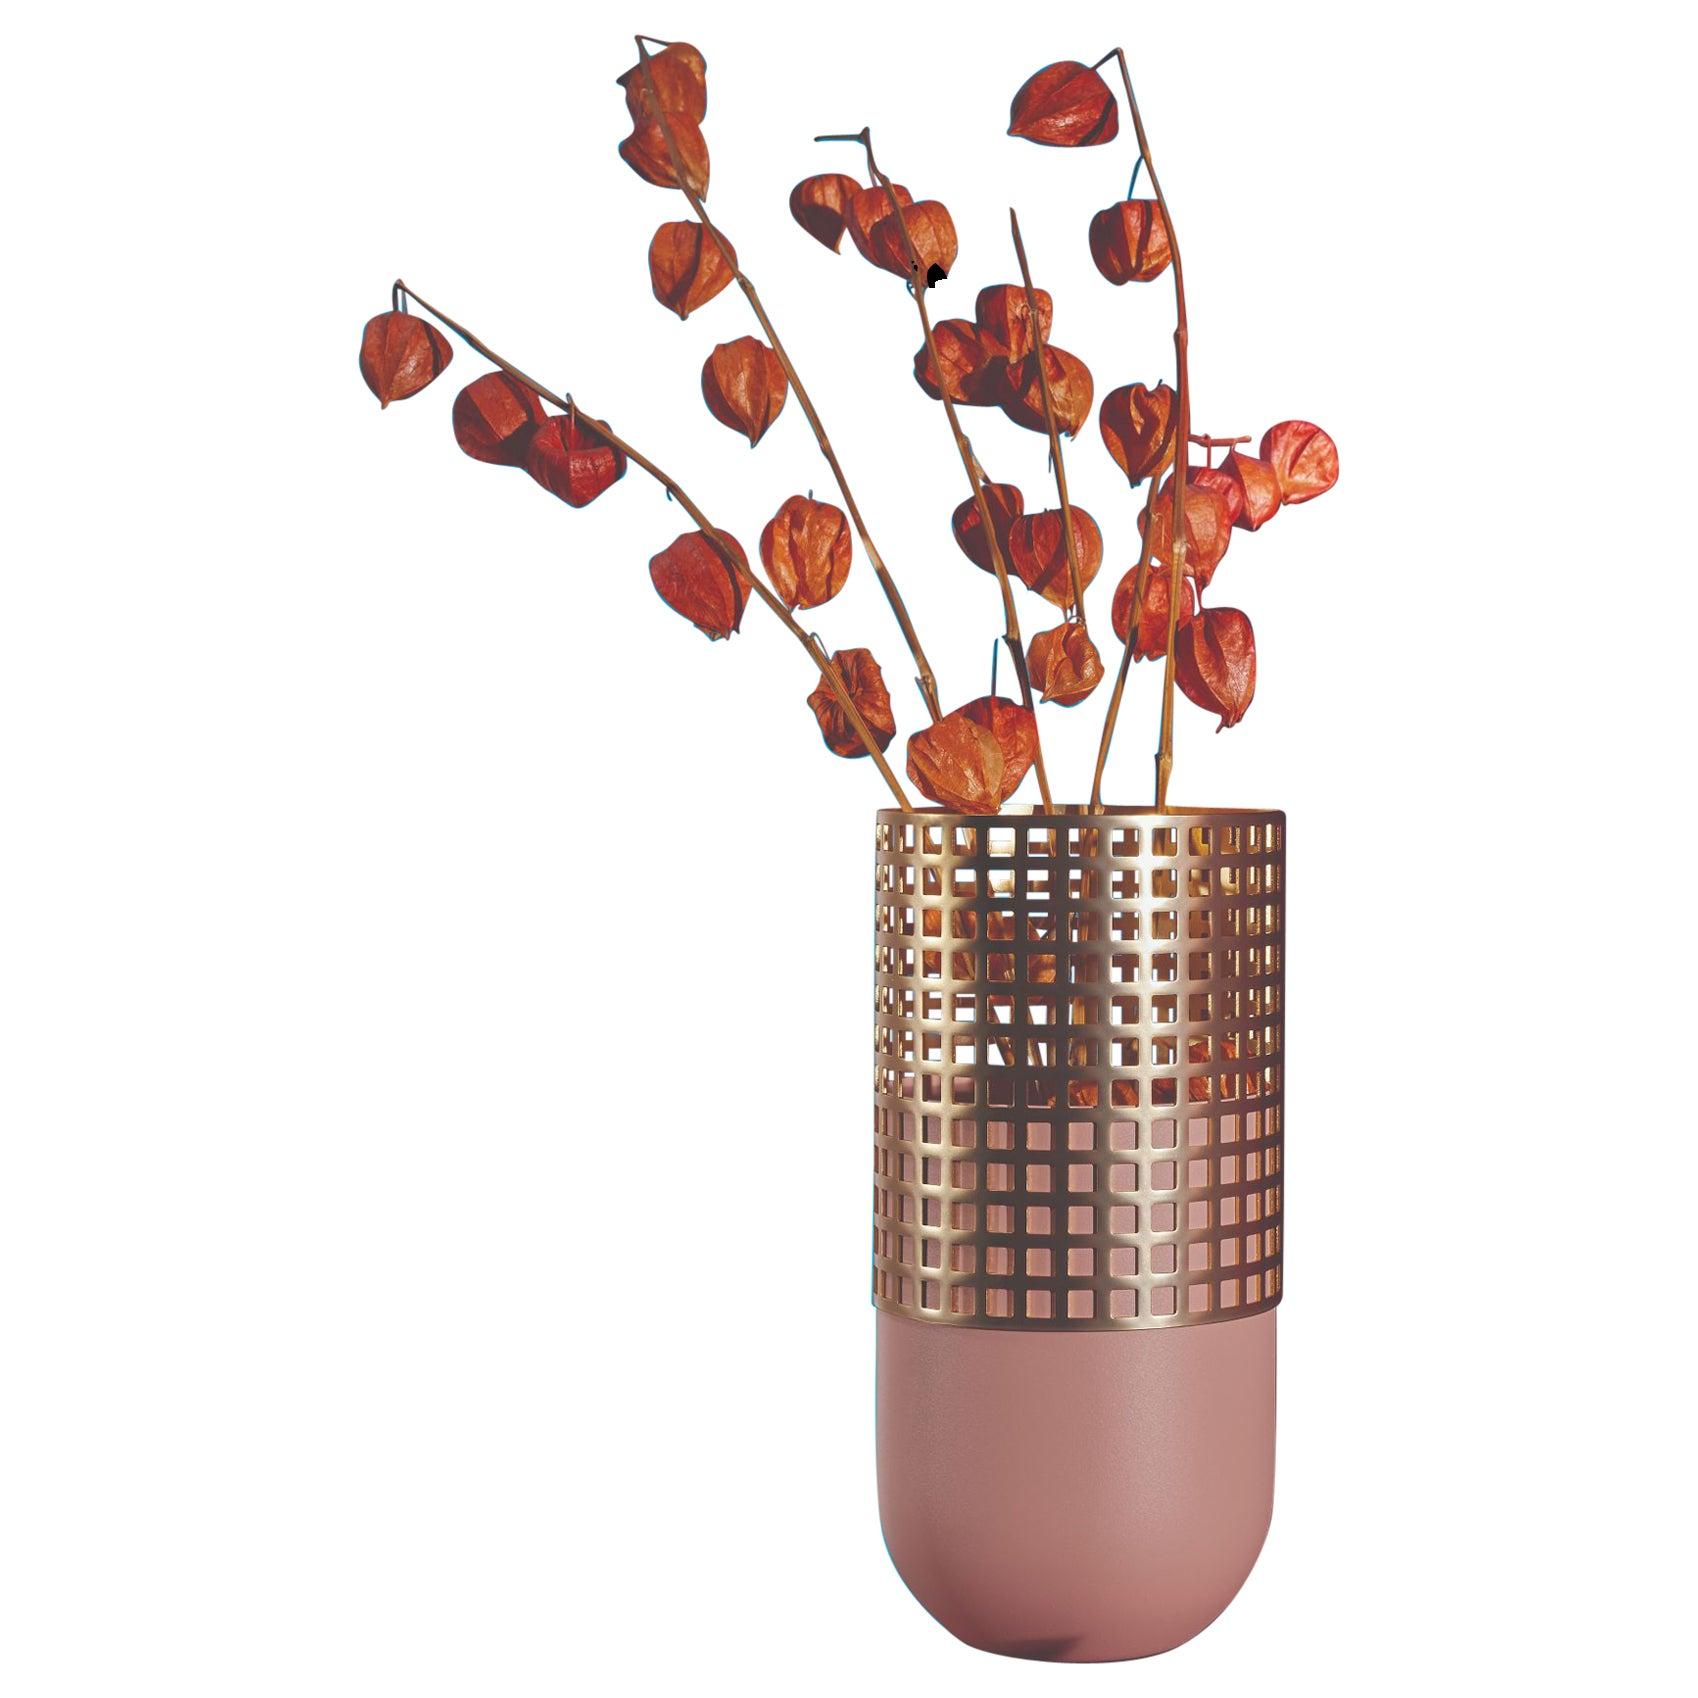 Mia Tall Vase by Serena Confalonieri